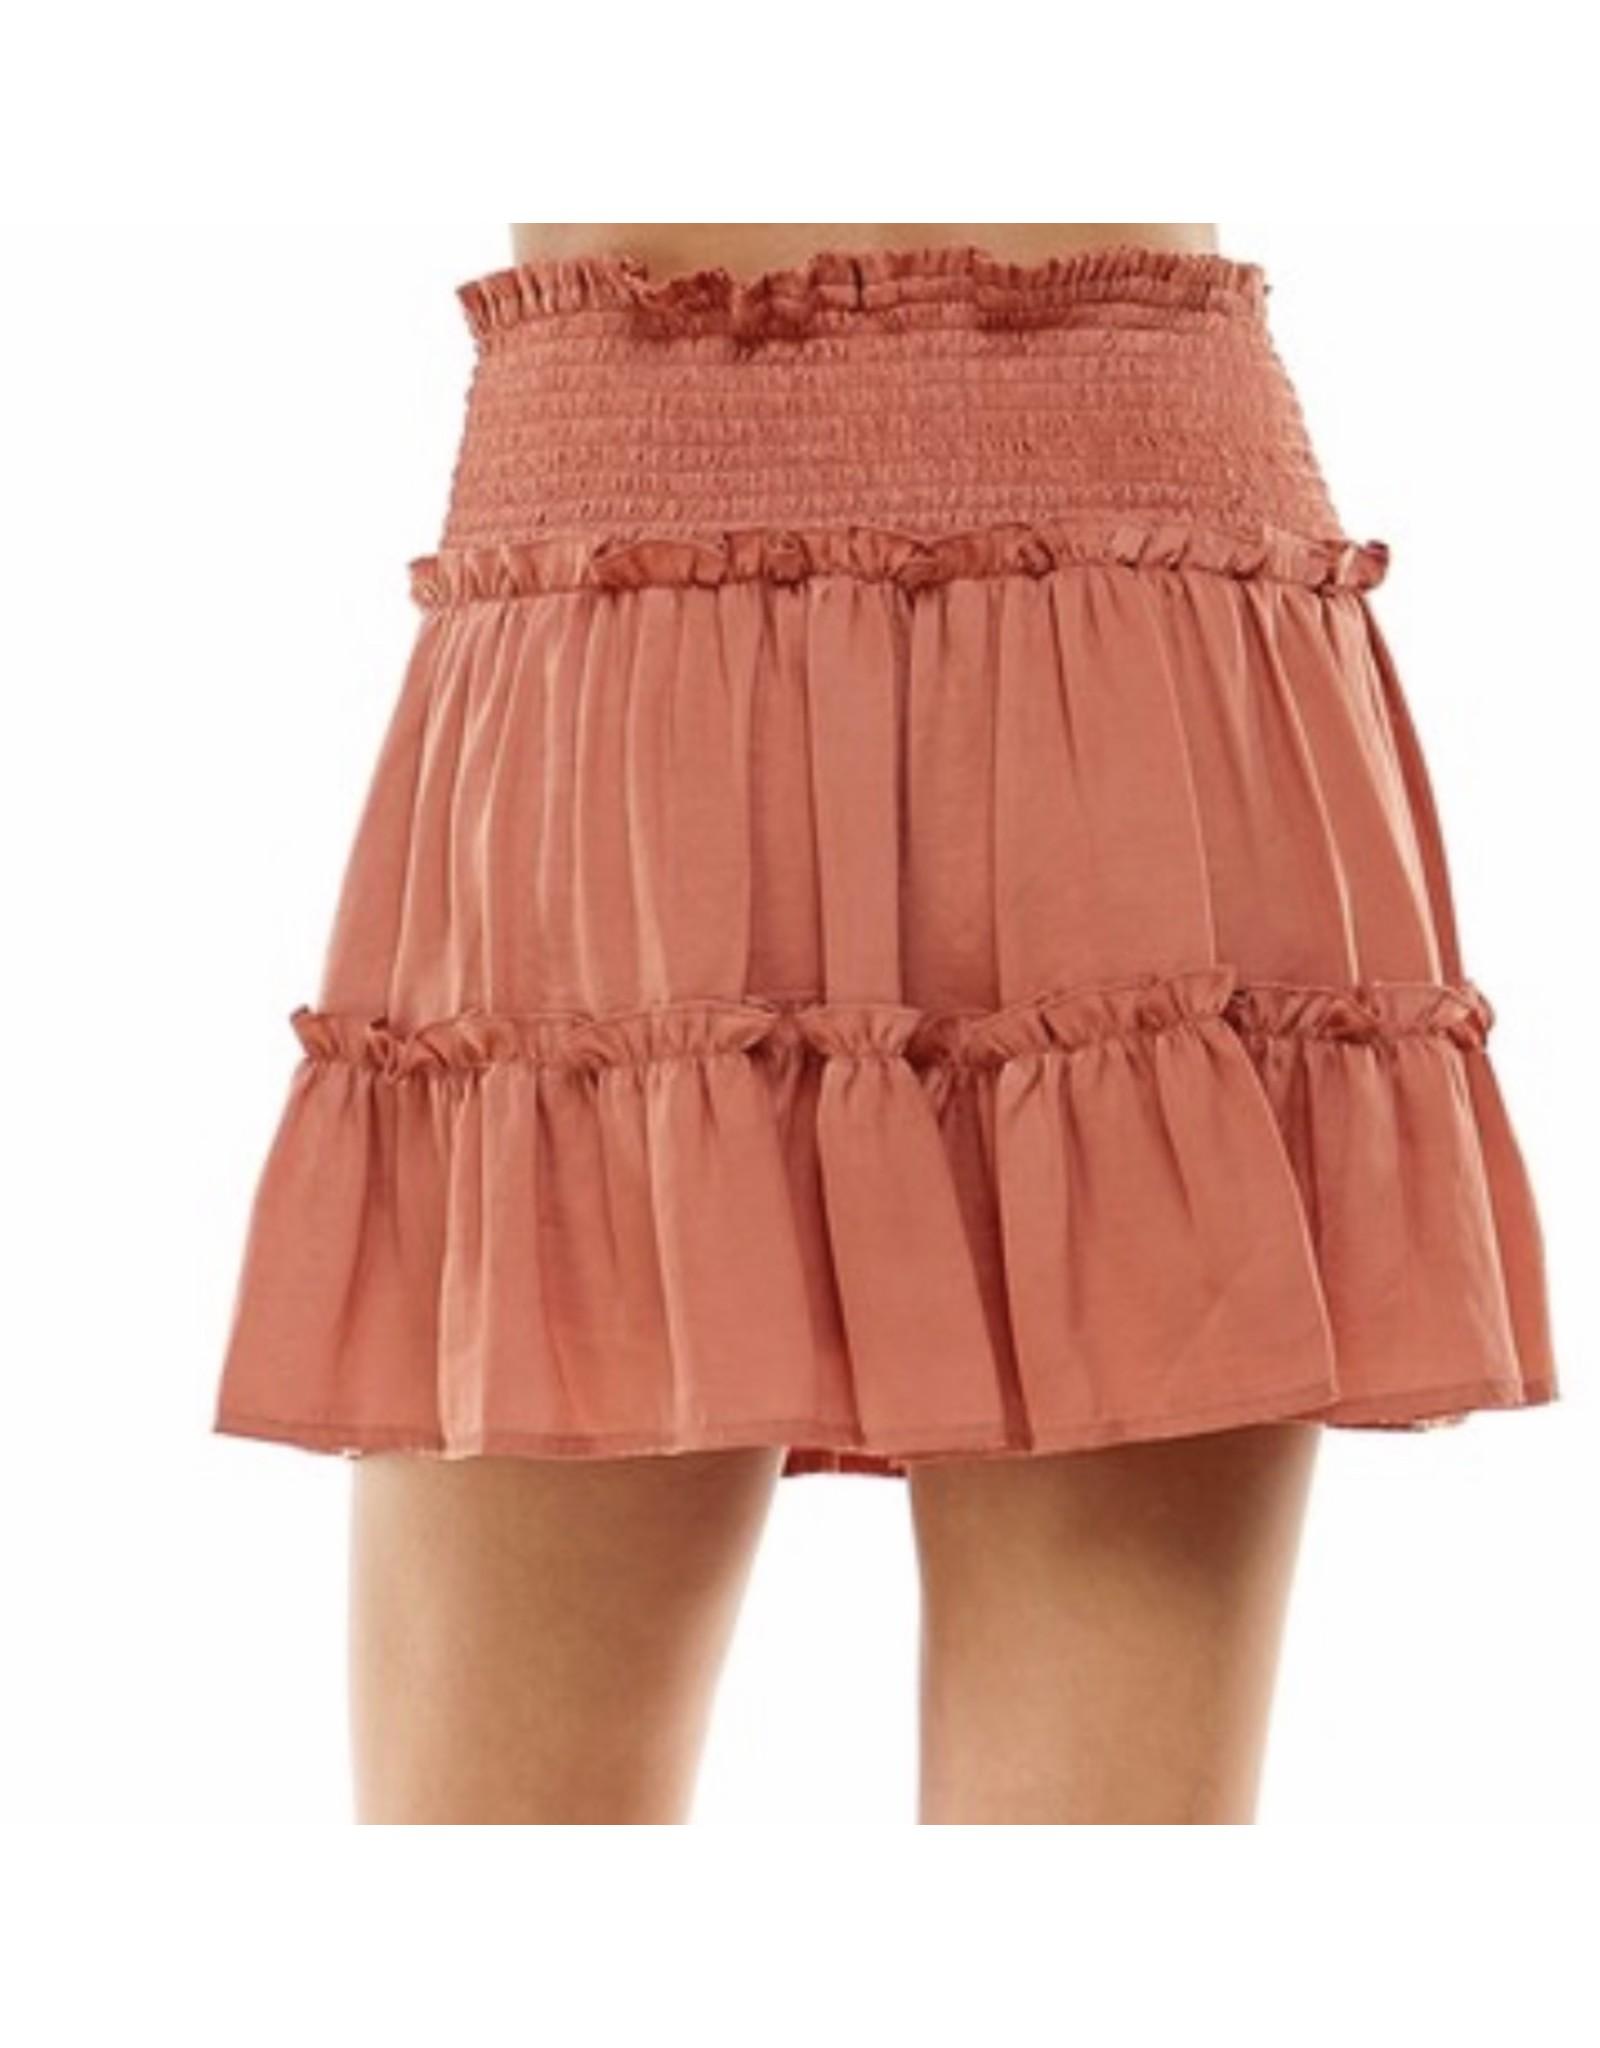 Ruffle Skirt - Copper